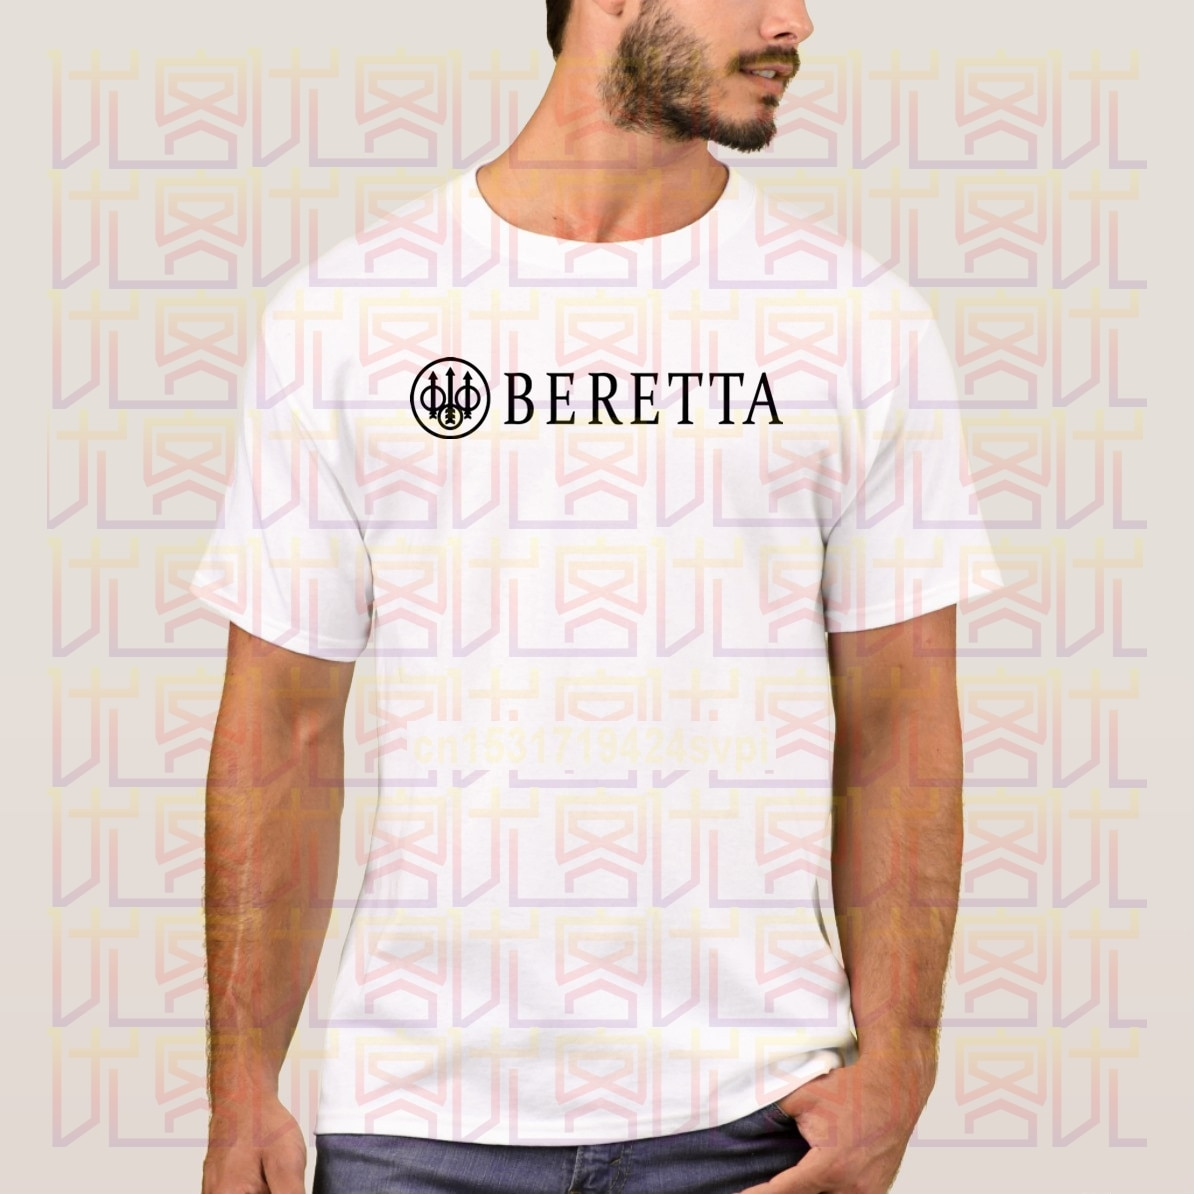 Novedosa camiseta de verano 2020 para hombre, ropa a la moda, camiseta Popular BERETTA negra con Logo de cuello redondo, 100% de algodón, camisetas para hombre, camisetas S-4XL